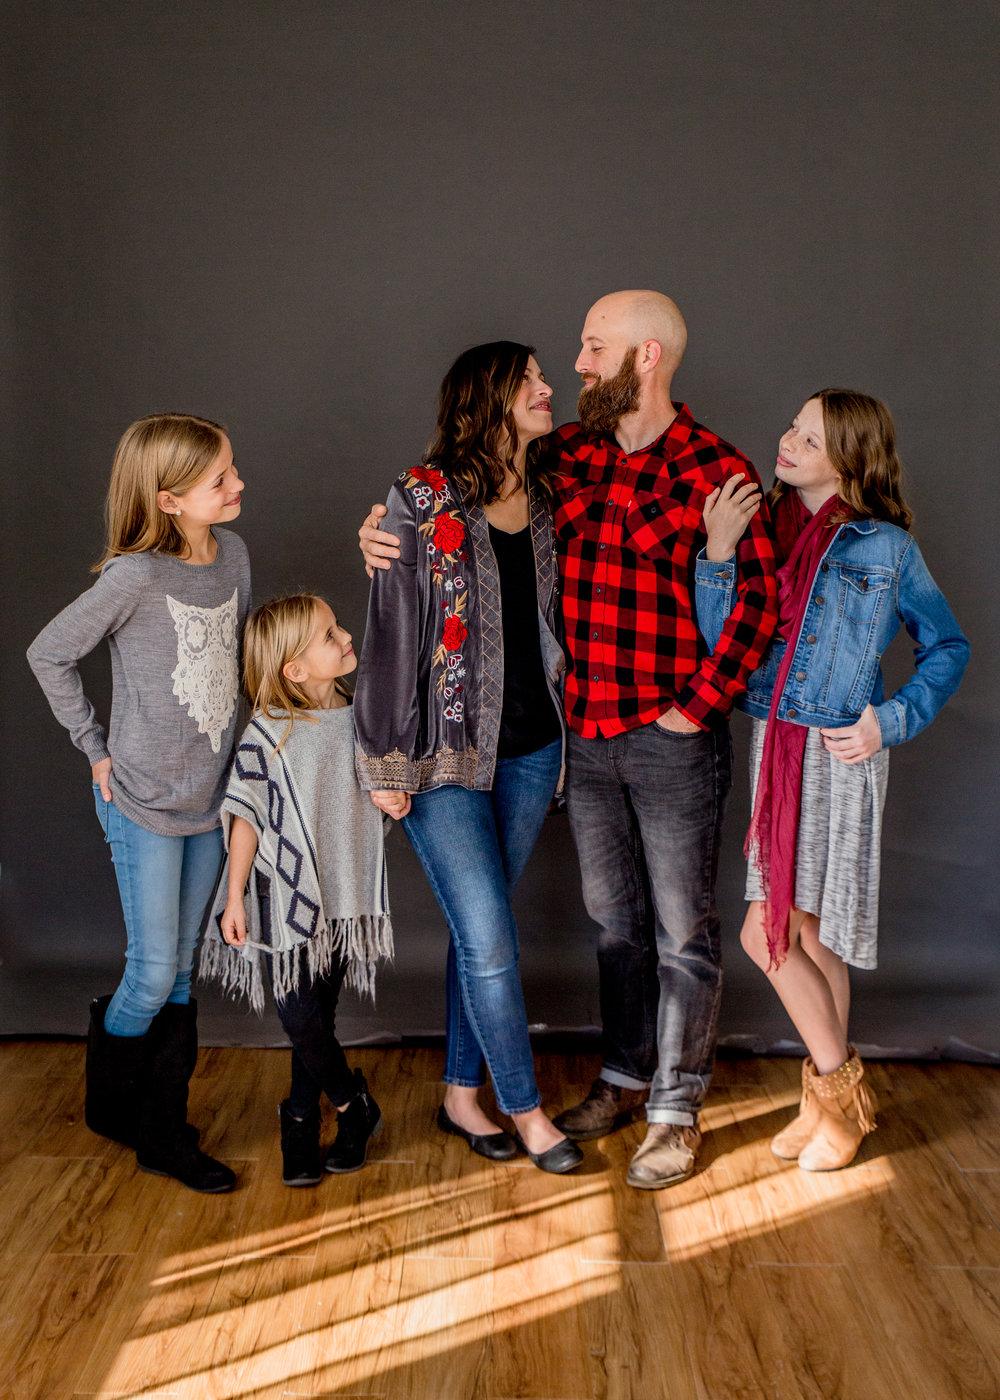 standrodfamily2018-26.jpg